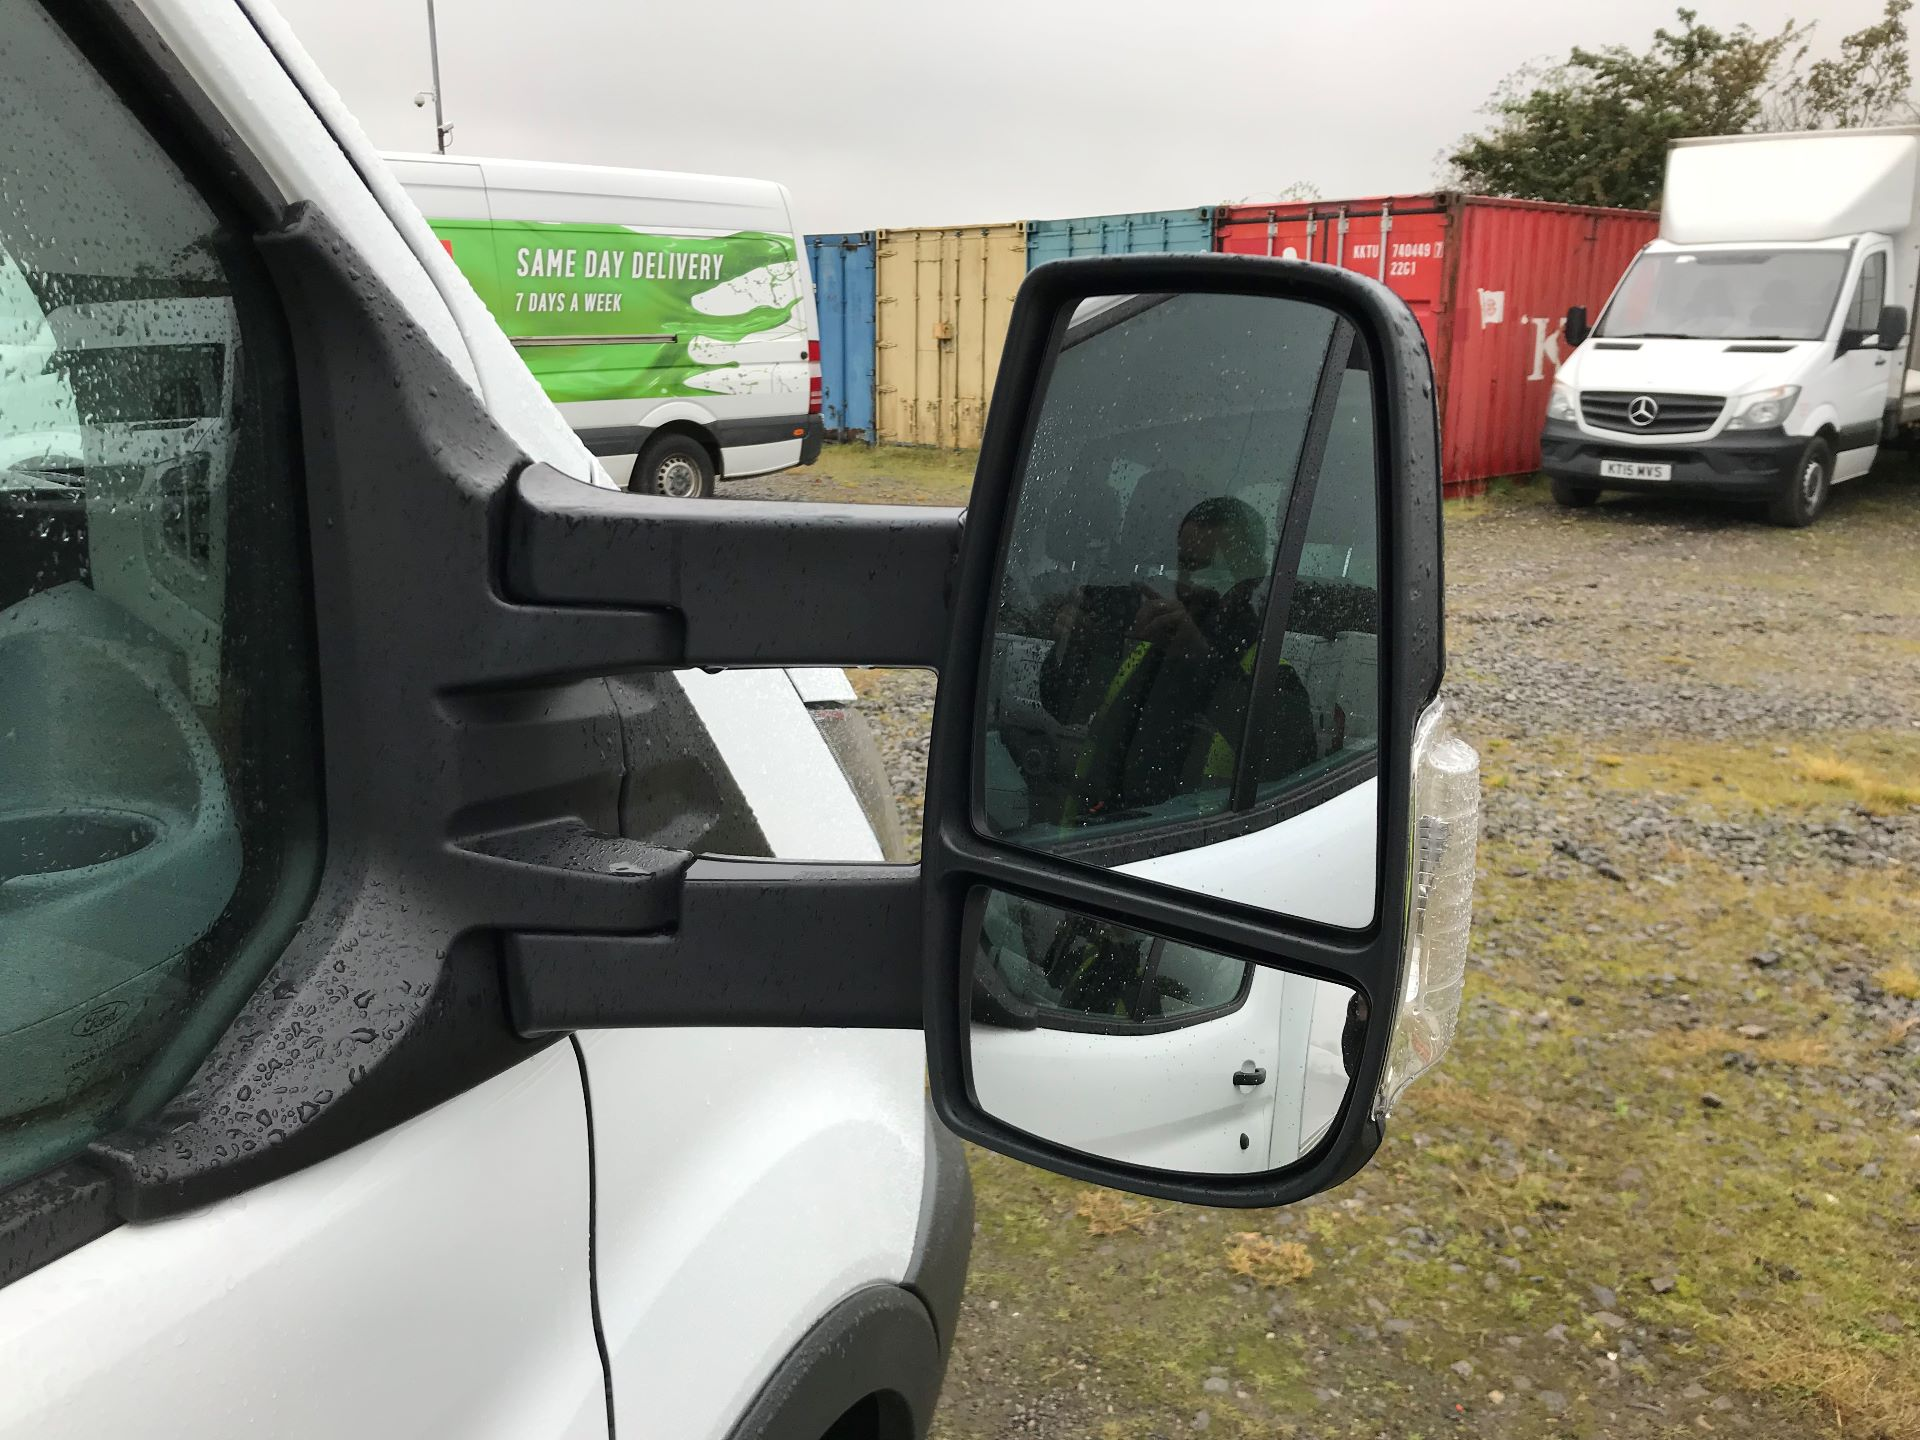 2018 Ford Transit 2.0 Tdci 130Ps One Stop Luton Van (MM67JJL) Image 10